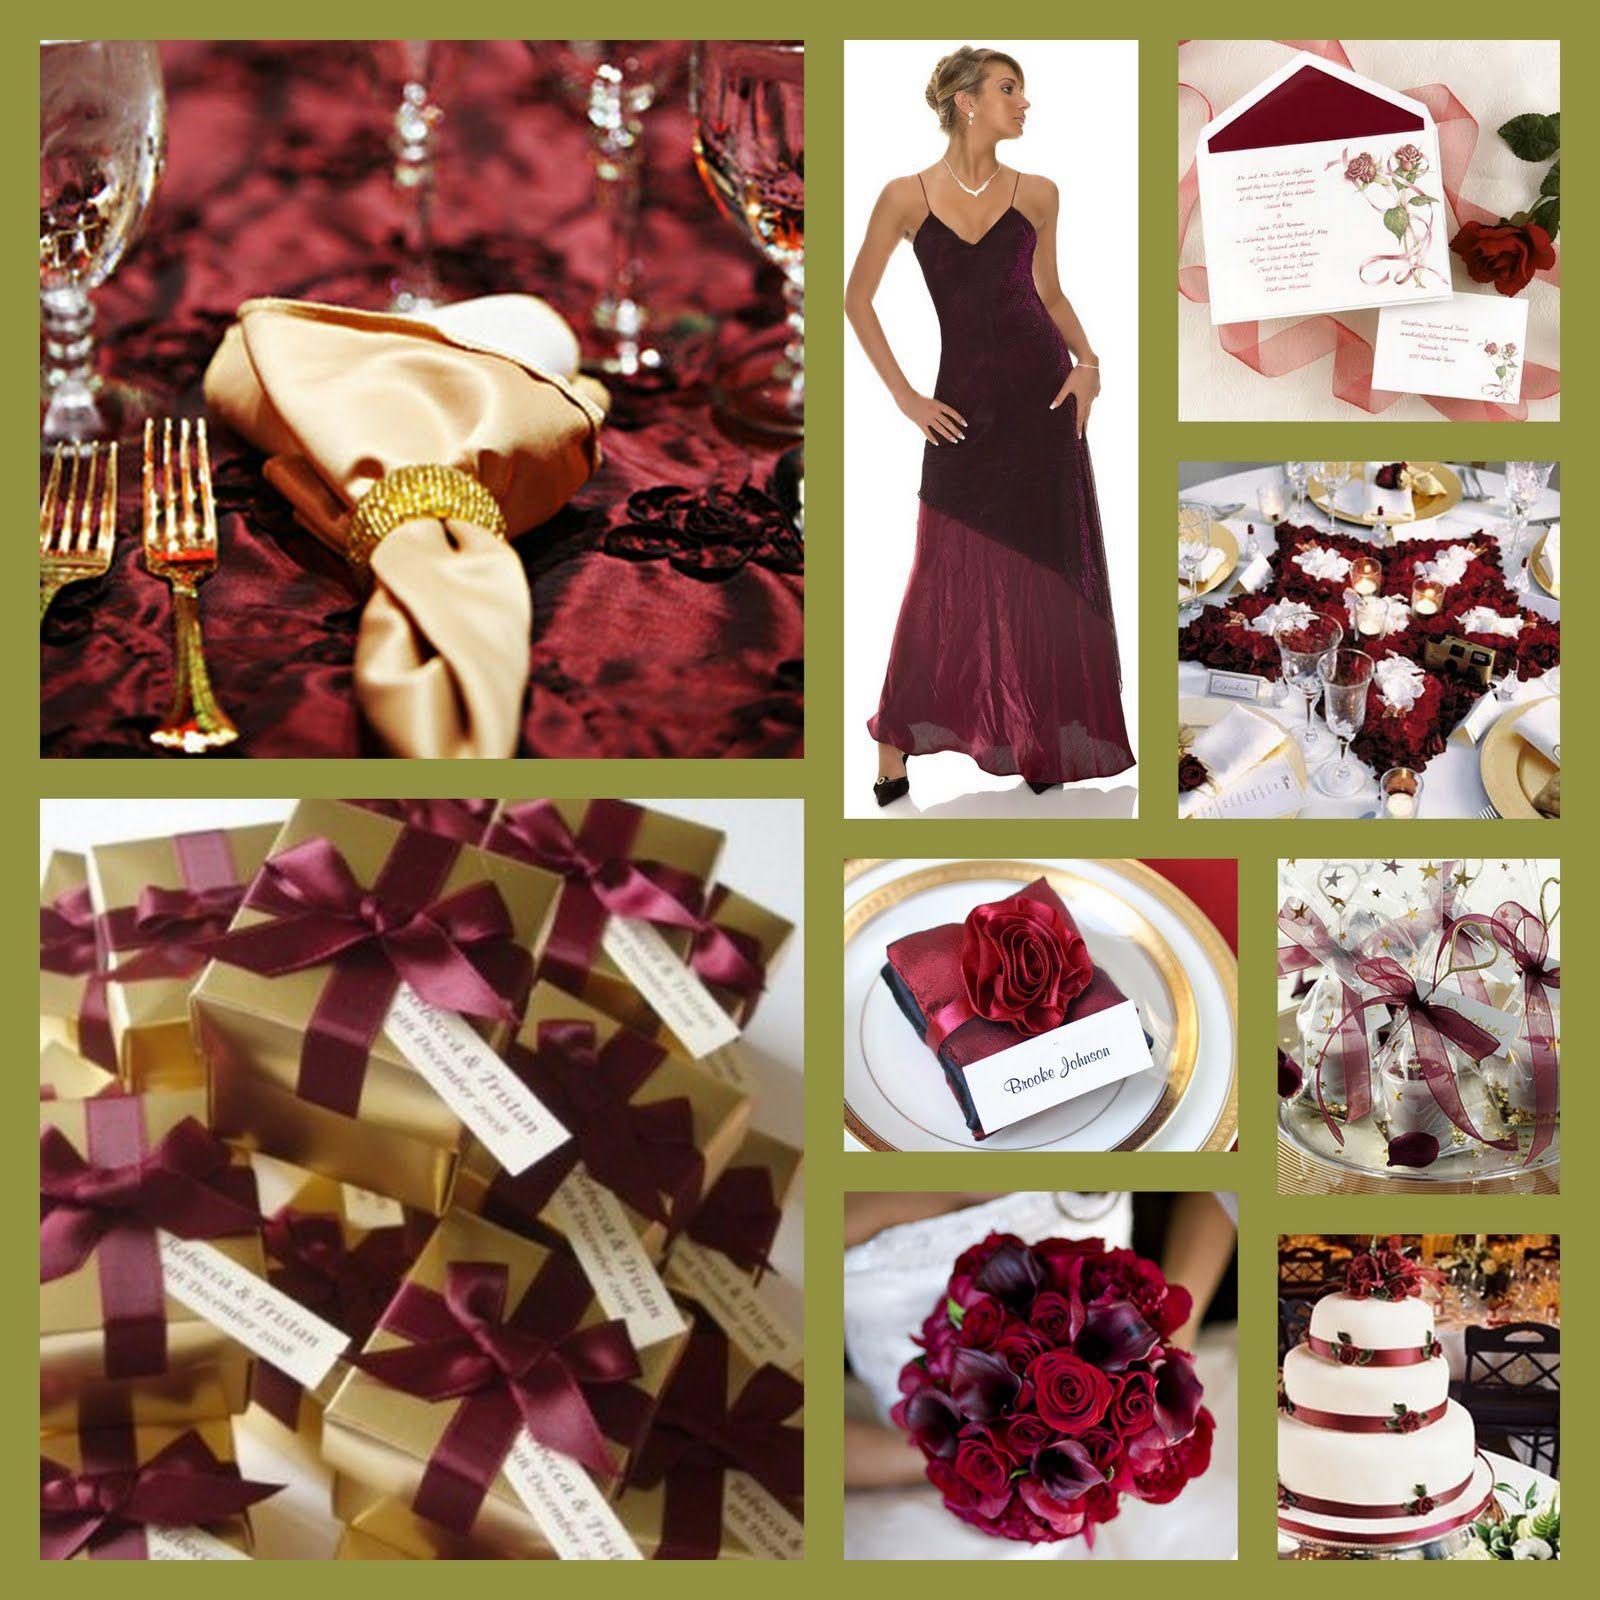 Dillards Wedding Gifts: Pin On Wedding Ideas